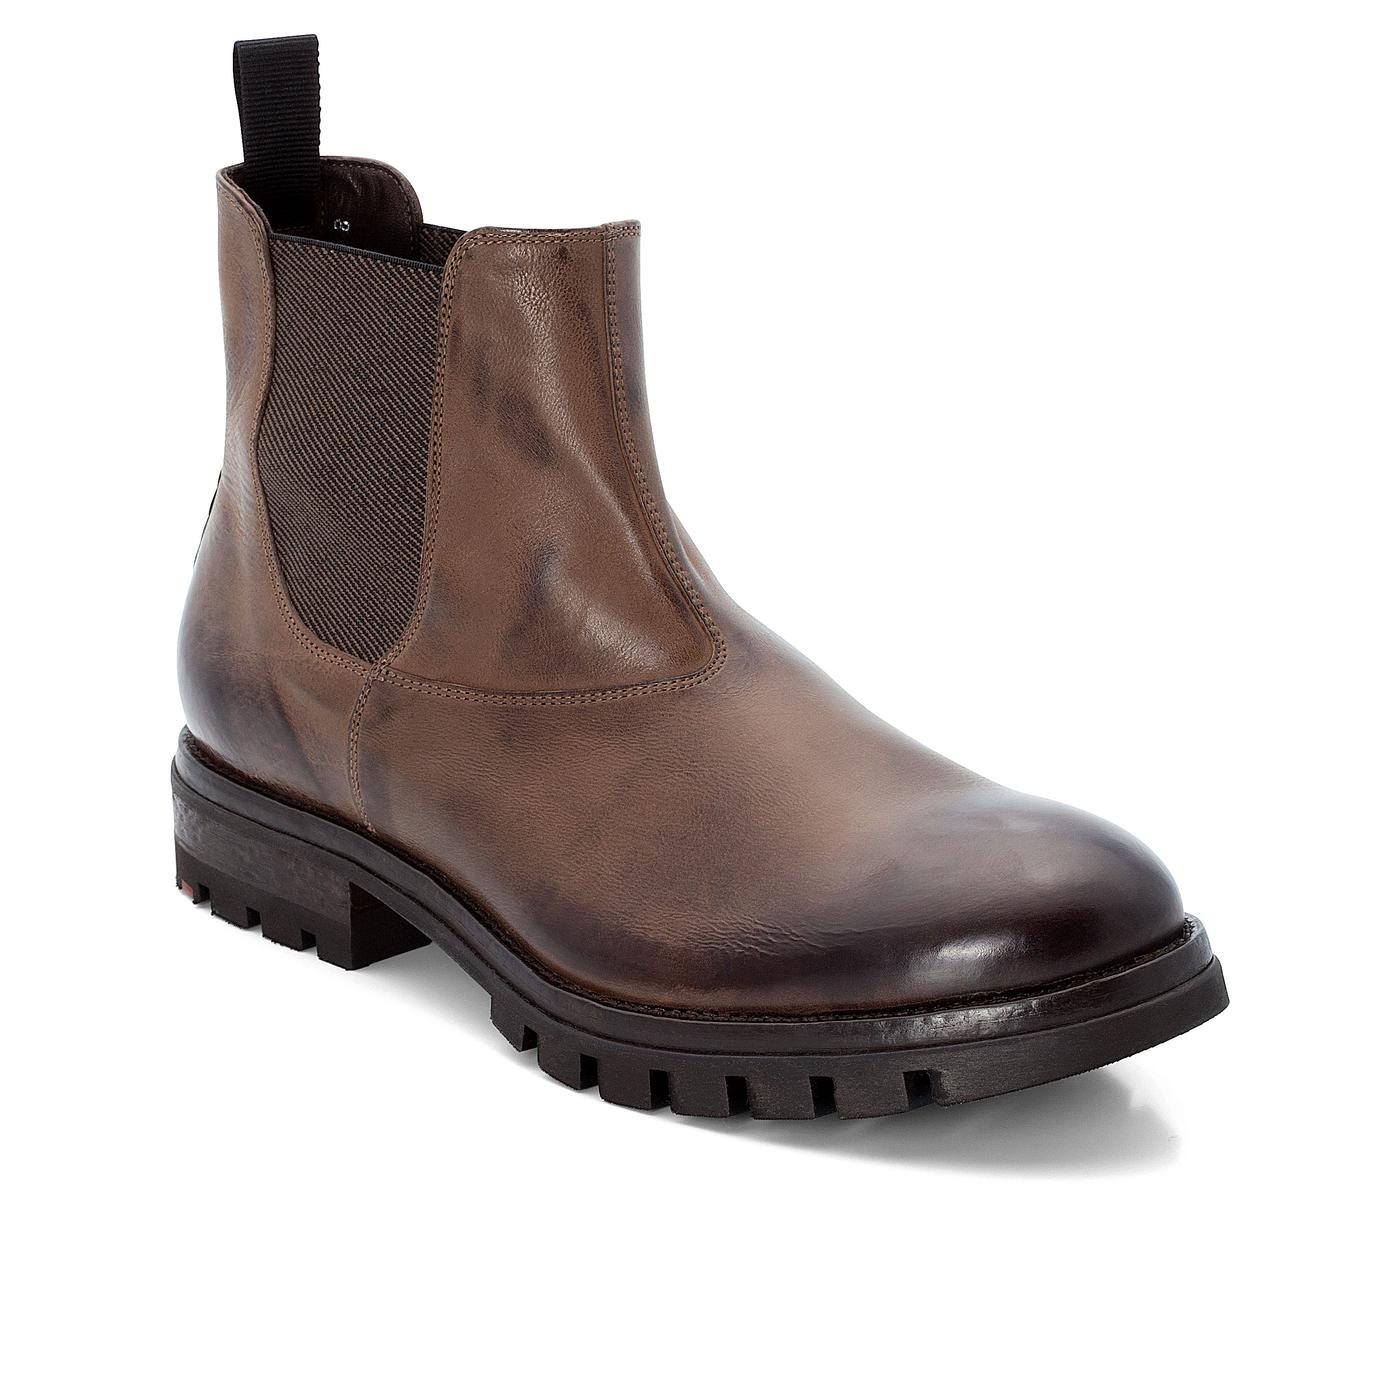 FLETCHER | Schuhe > Boots | Lloyd